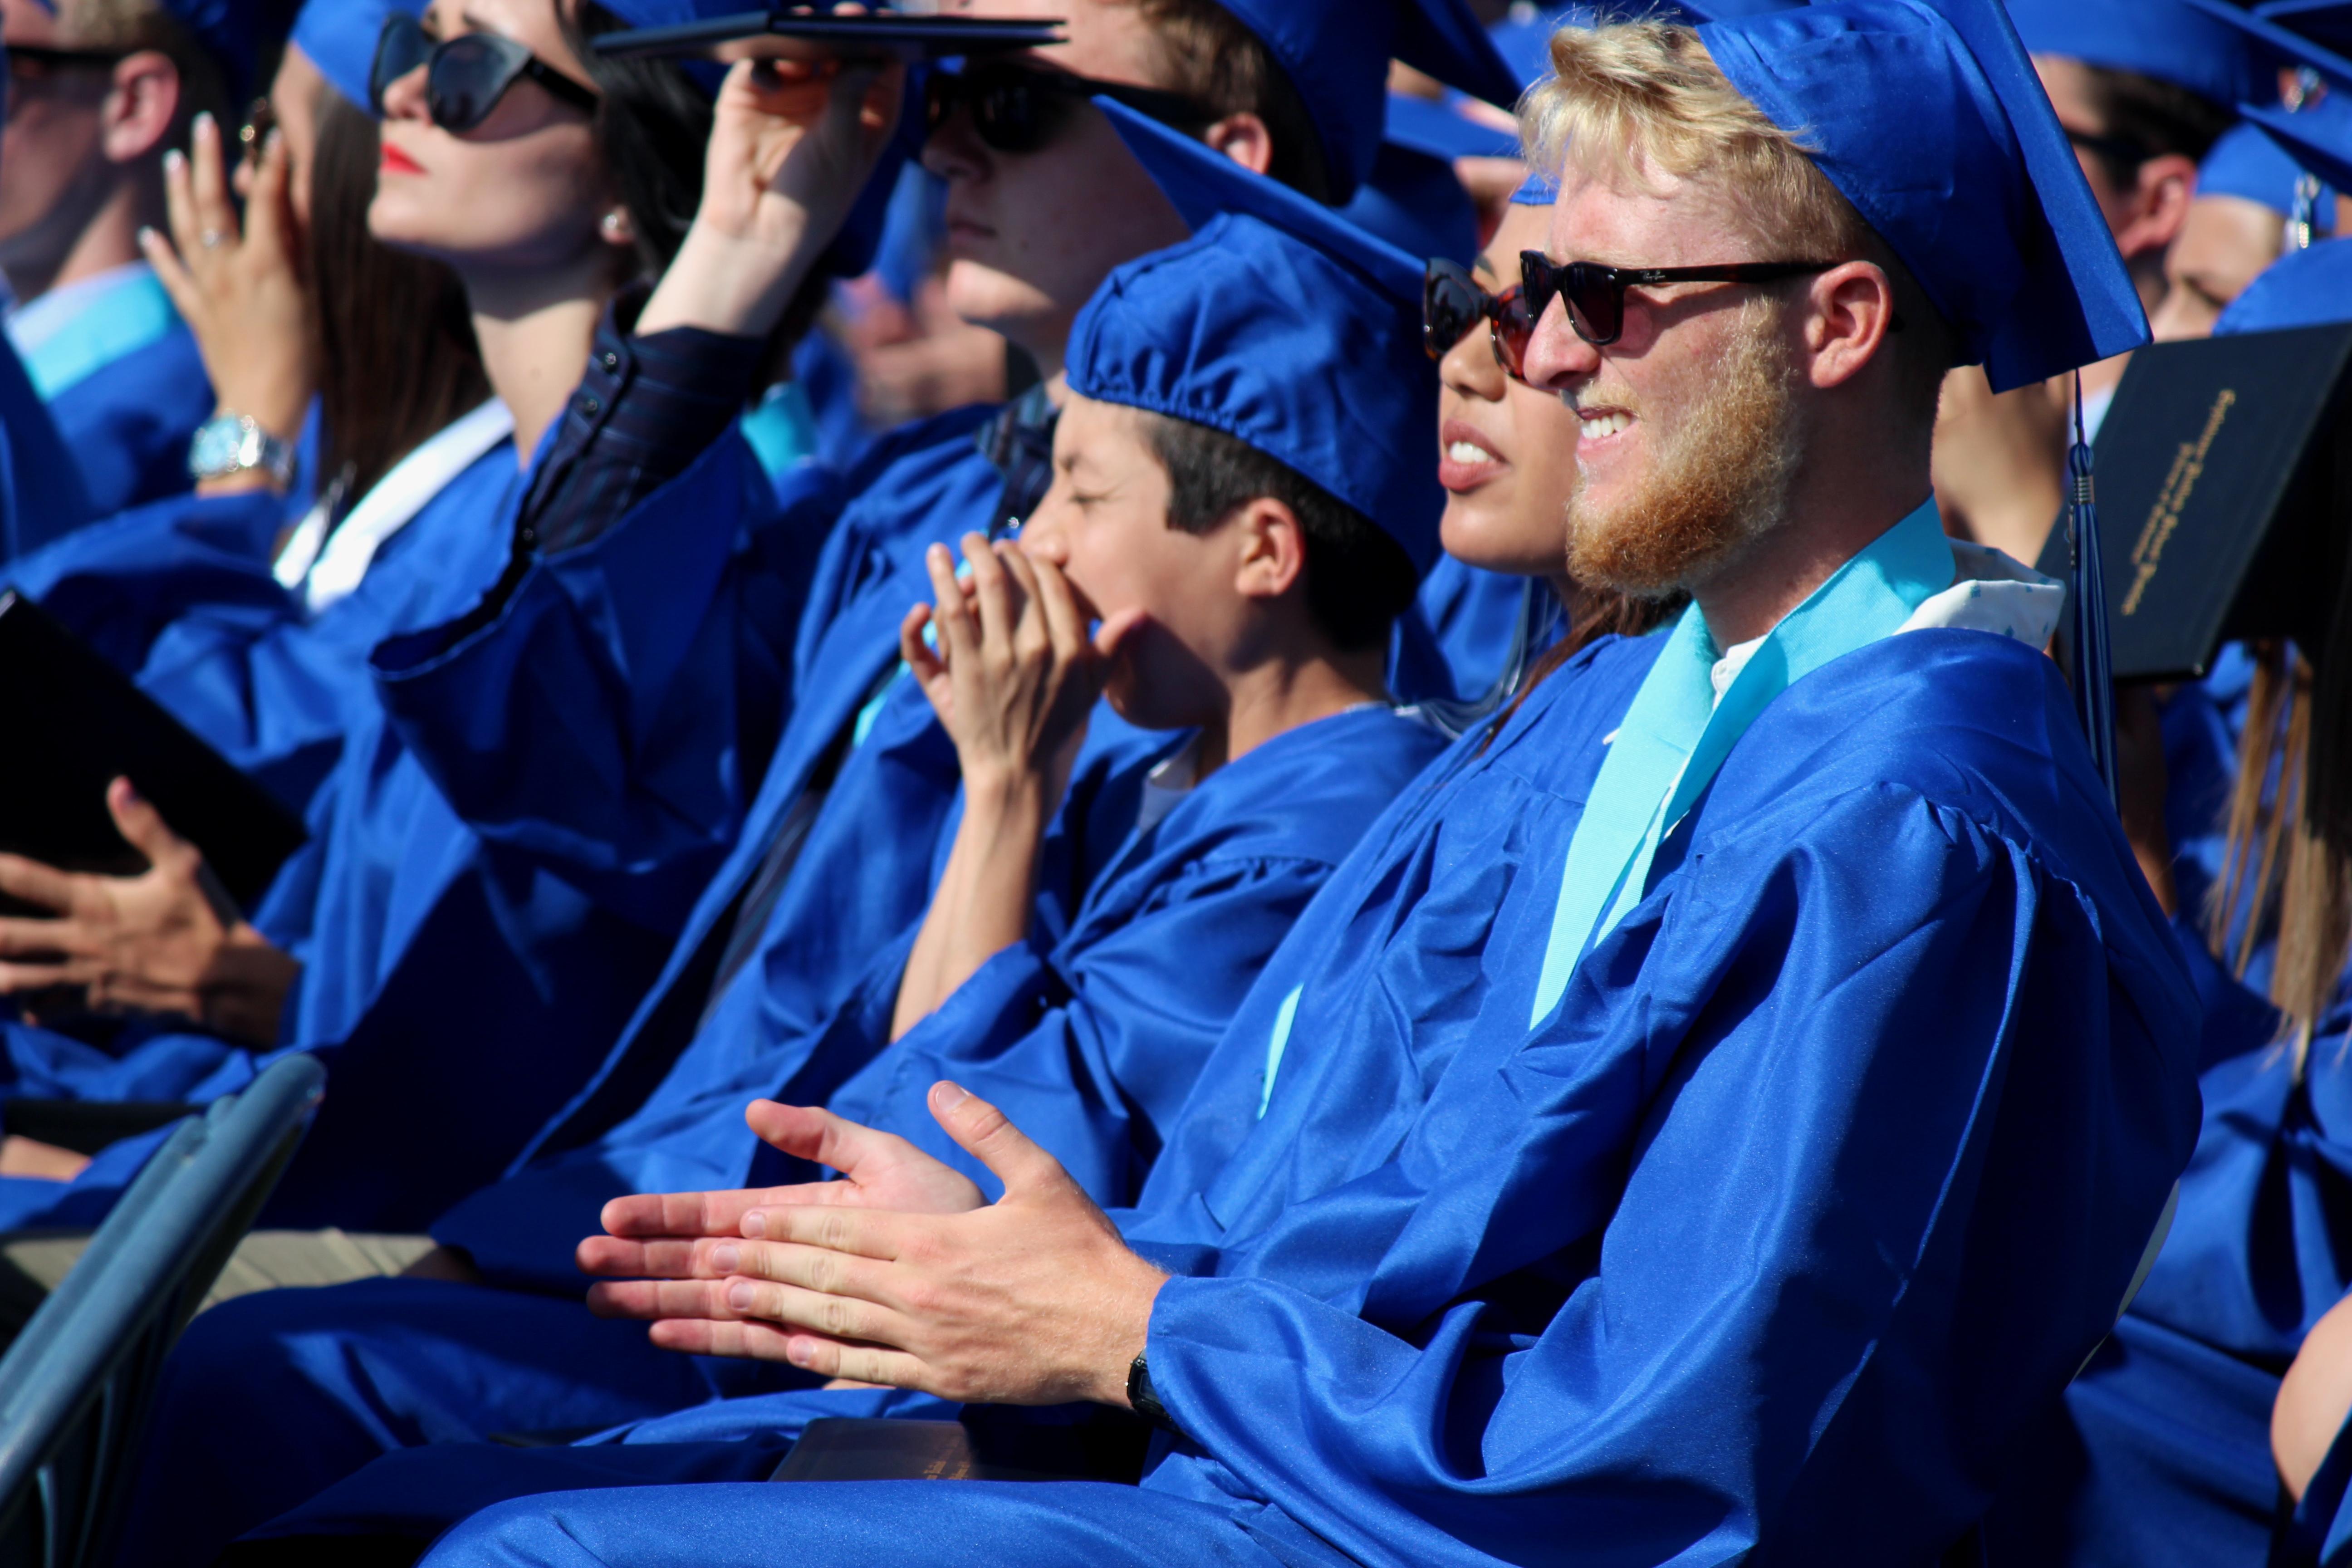 Students Applaud During Graduation